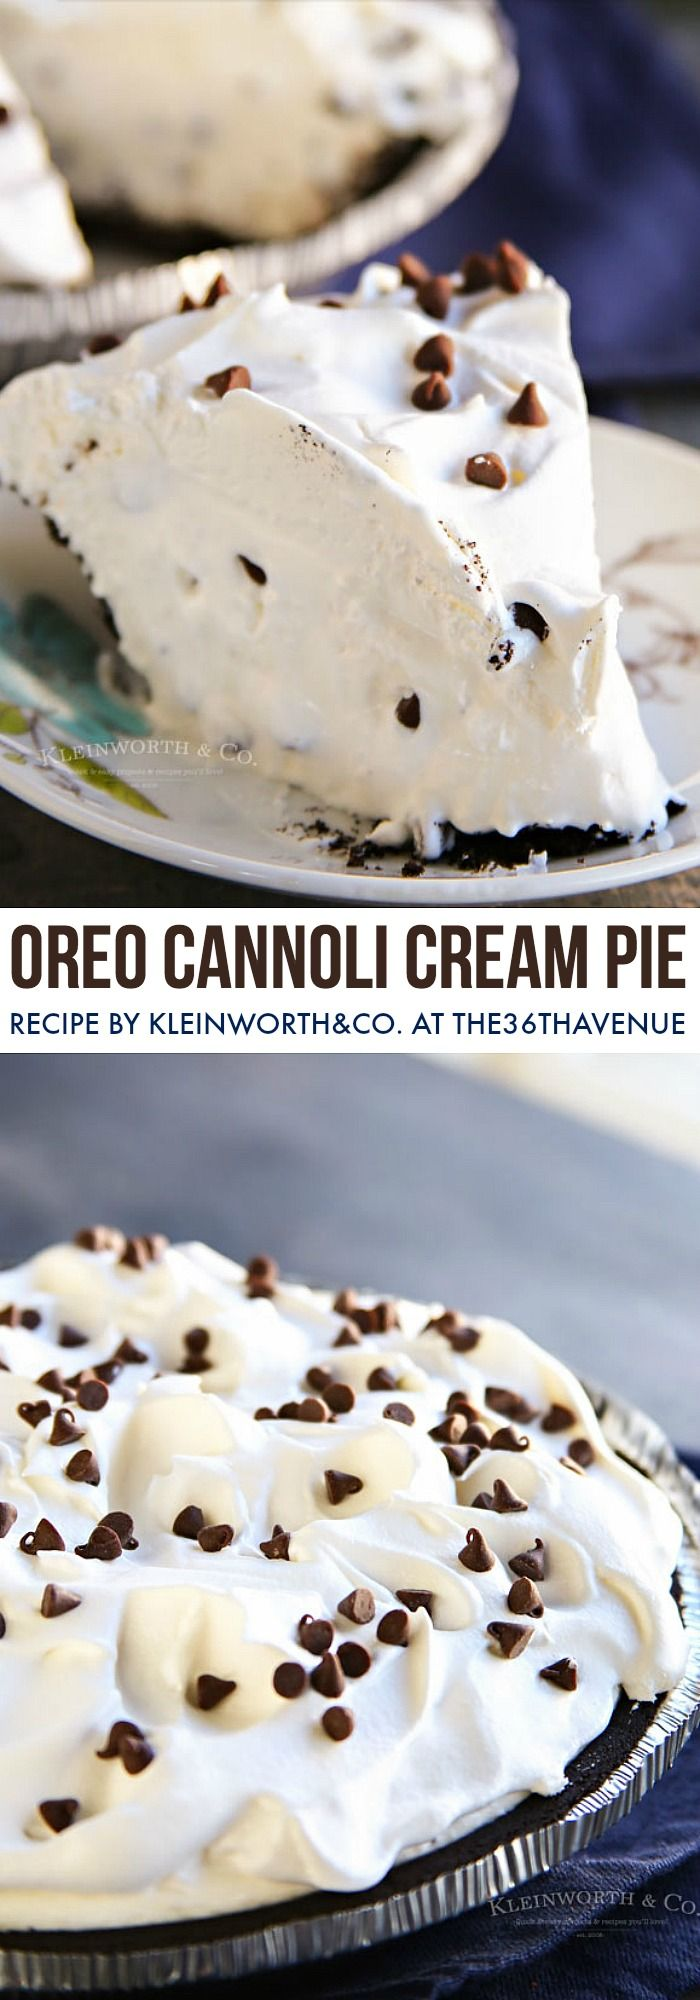 Easy Pie Recipe - This Oreo Cannoli Cream Pie is the perfect dessert for every celebration